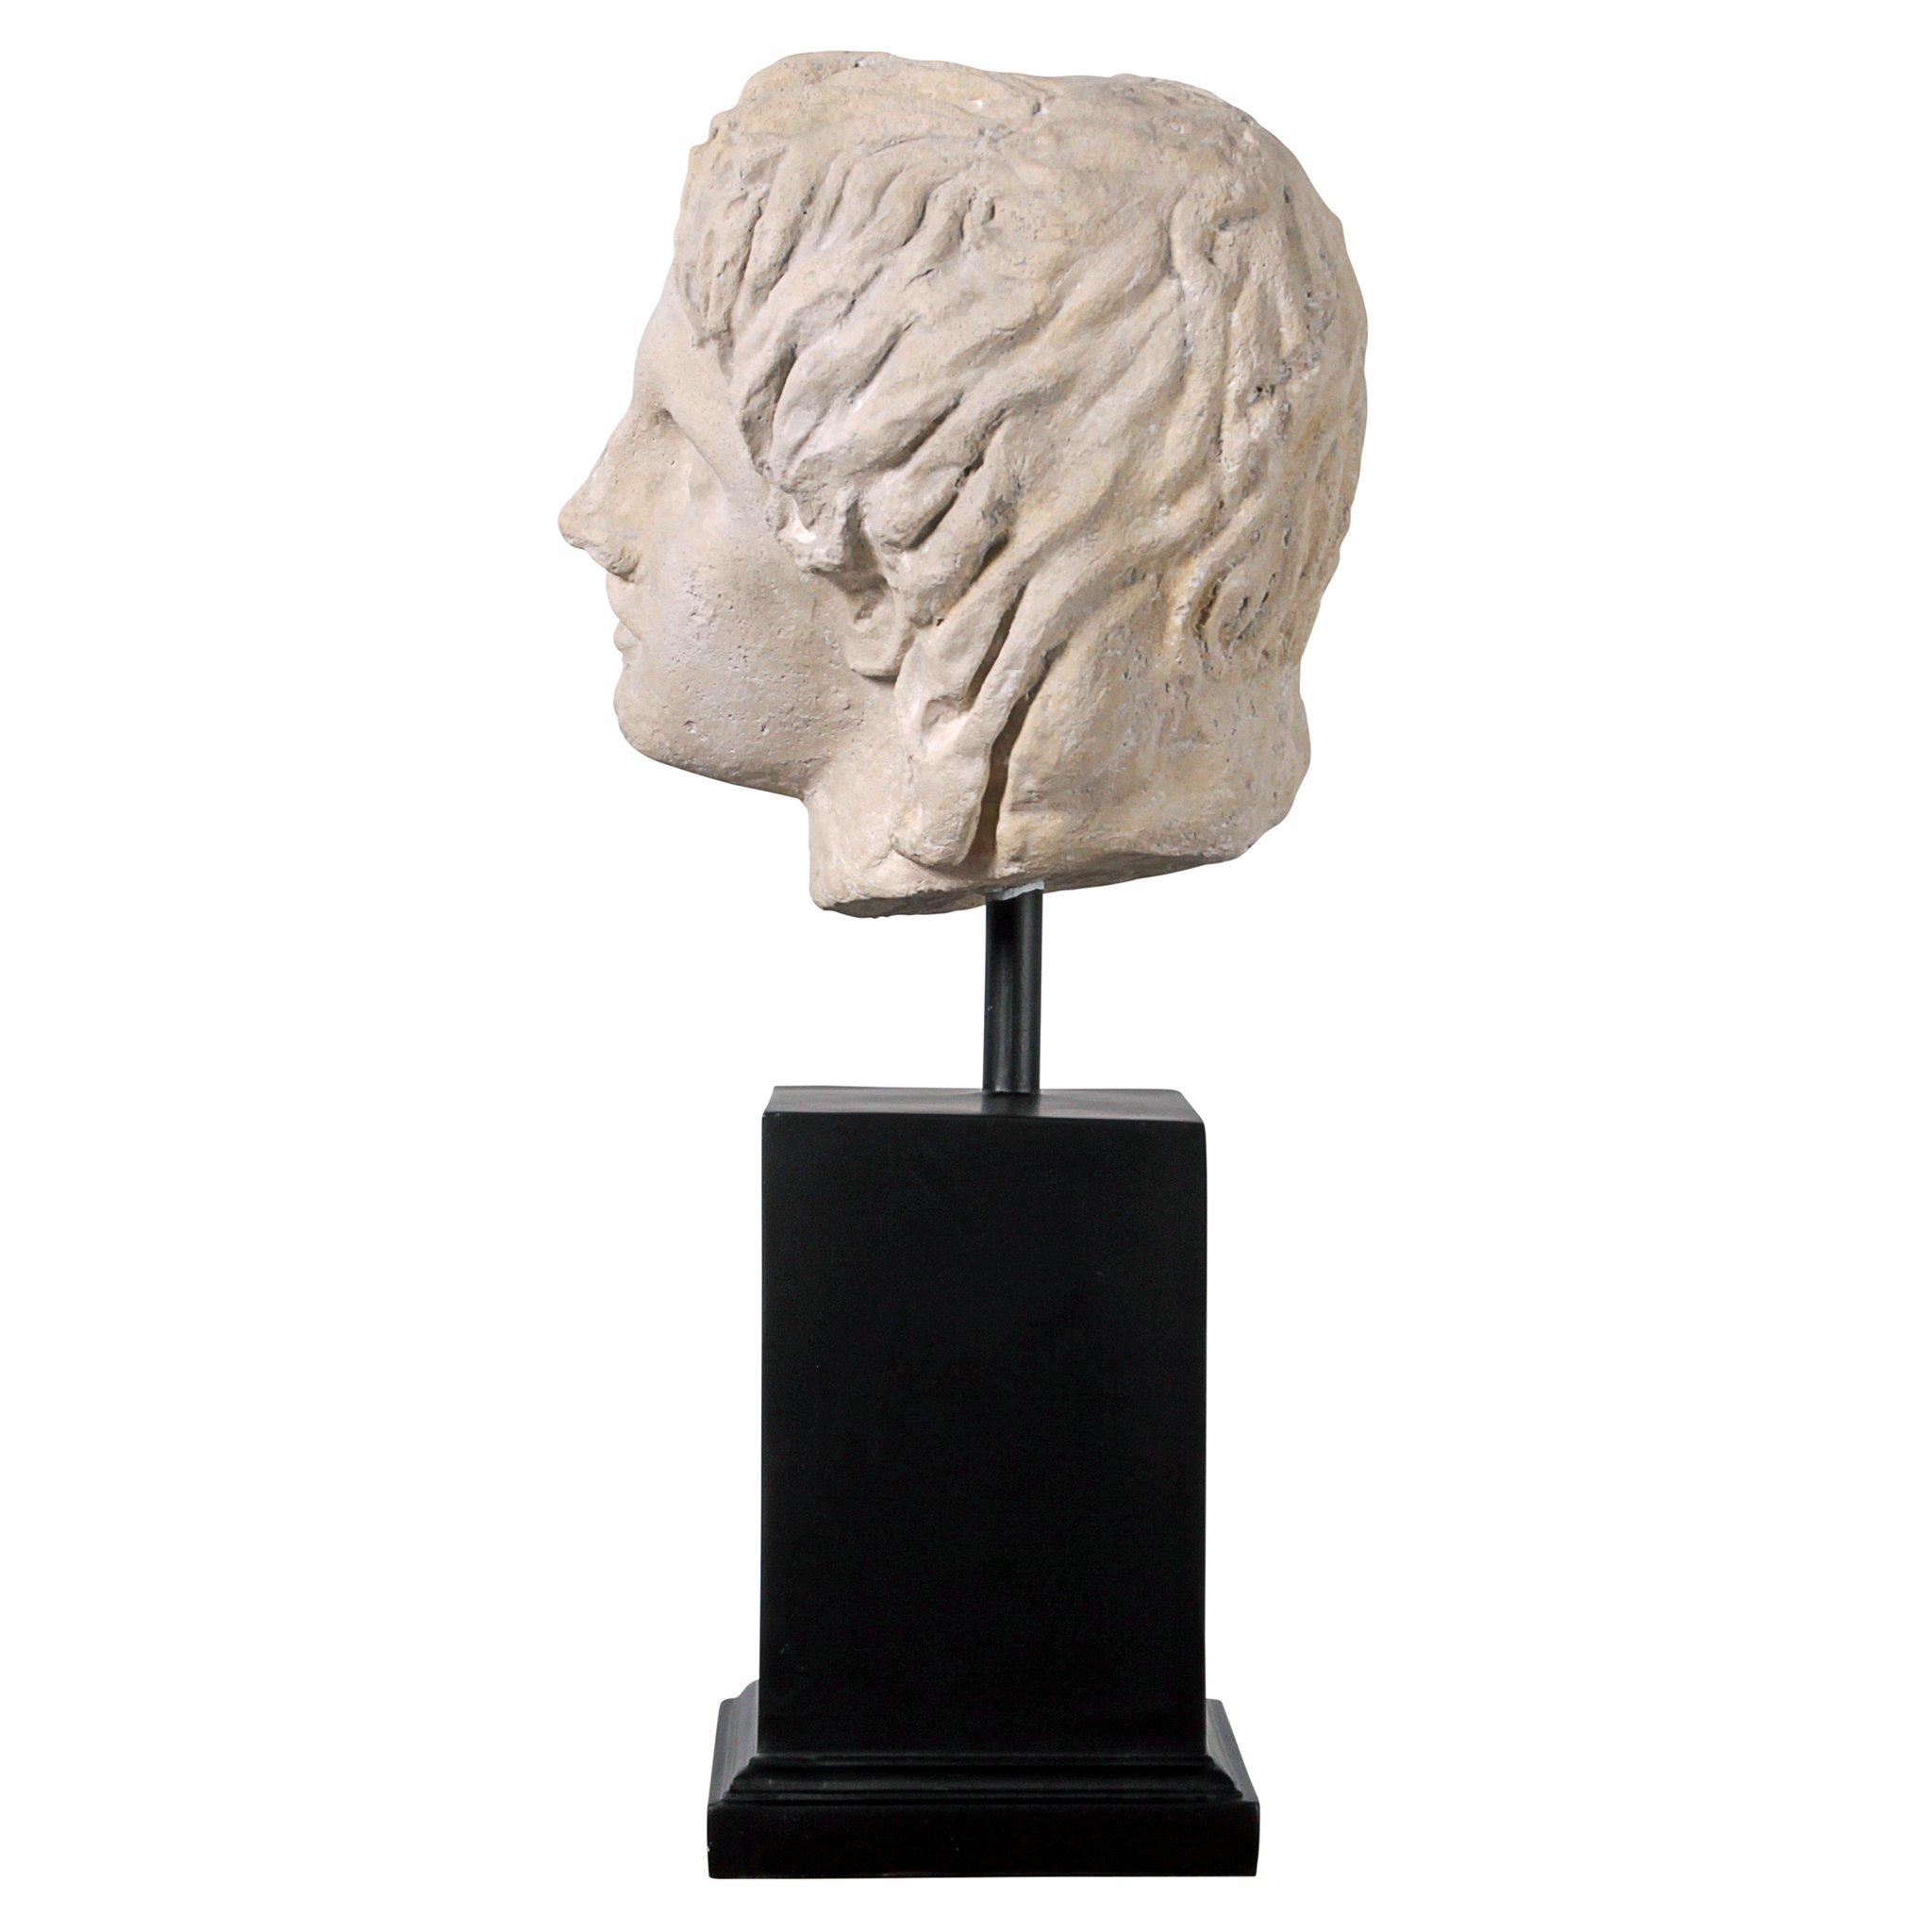 Design Toscano Alexander The Museum Mount Sculptural Bust, Antique Stone by Design Toscano (Image #4)